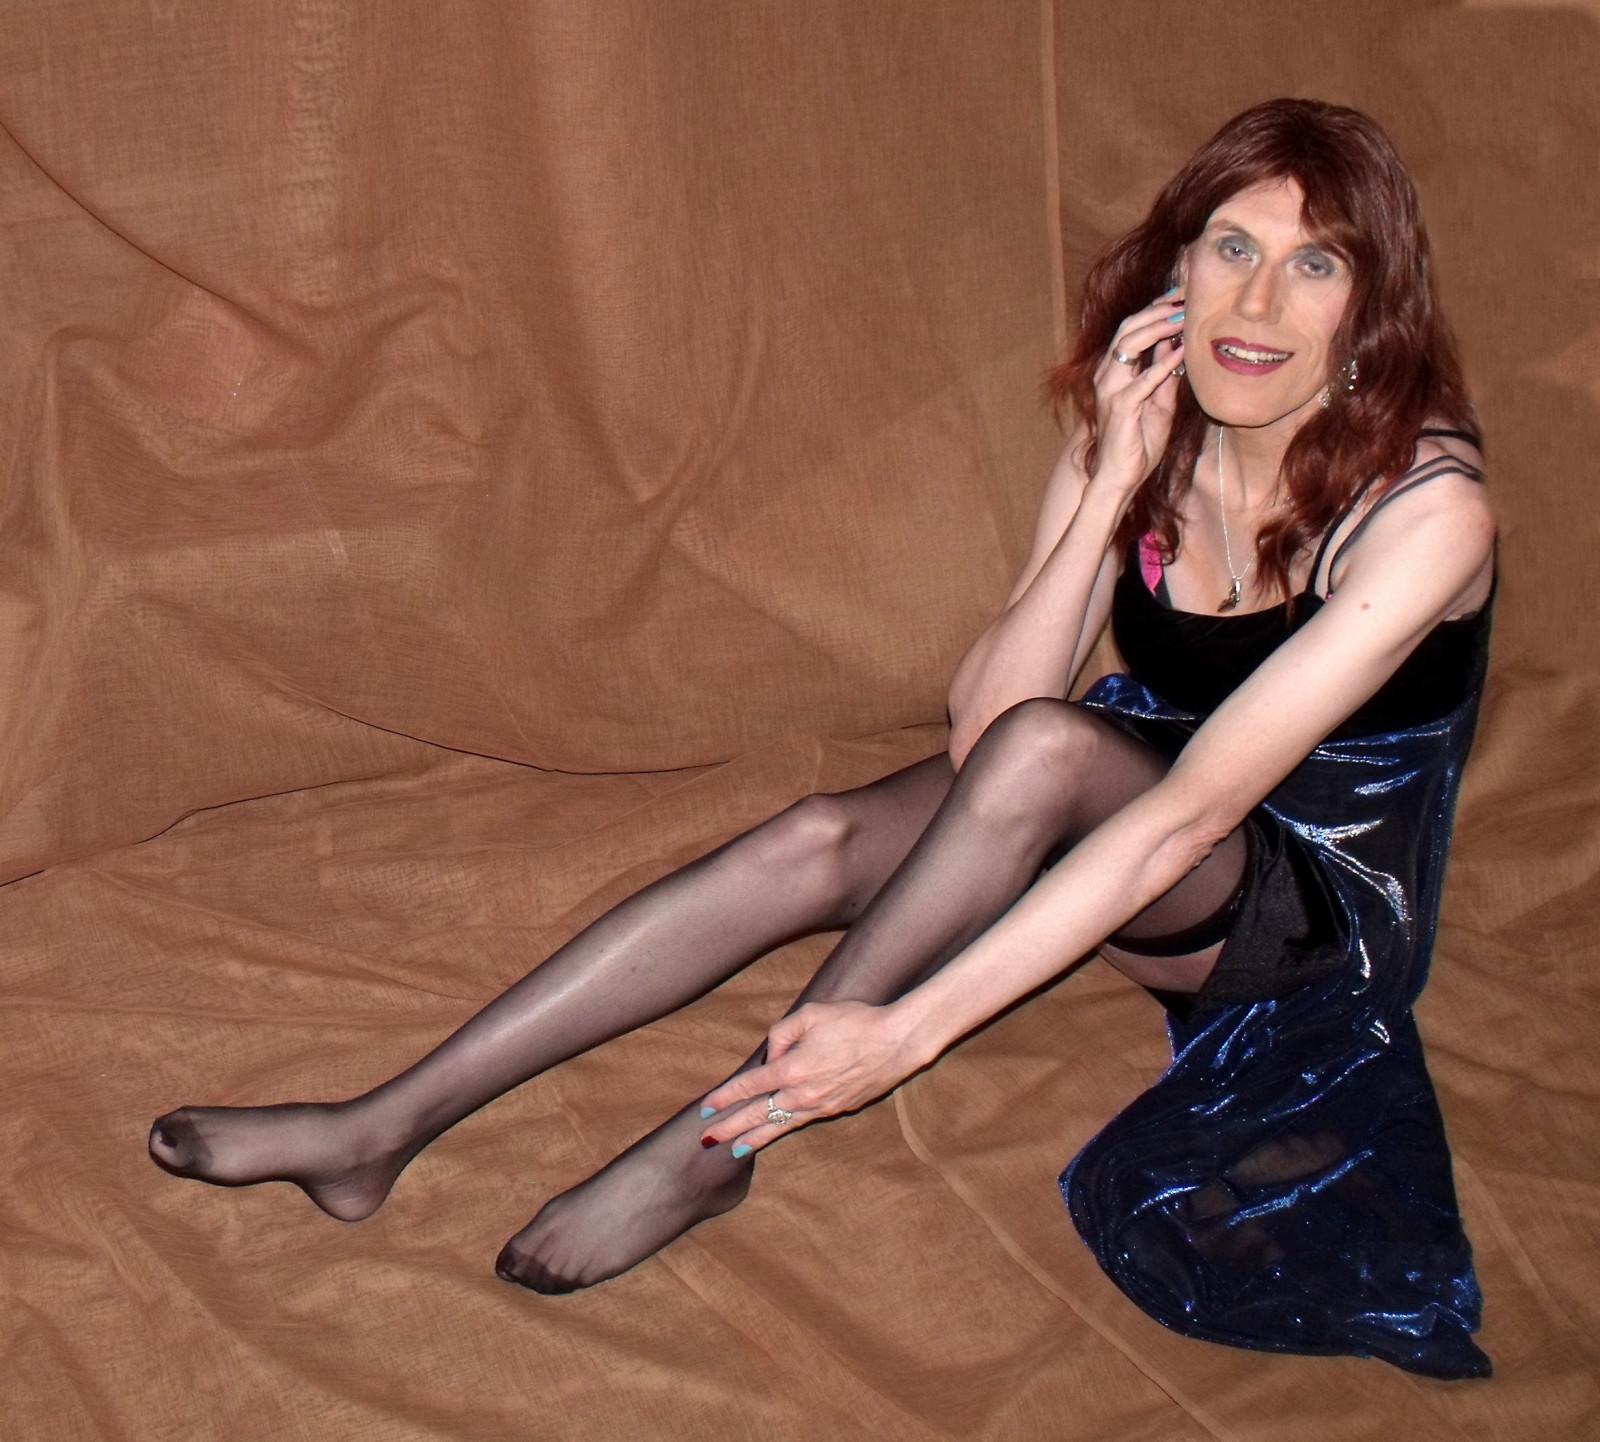 Wallpaper : long hair, sitting, pantyhose, tights, TV